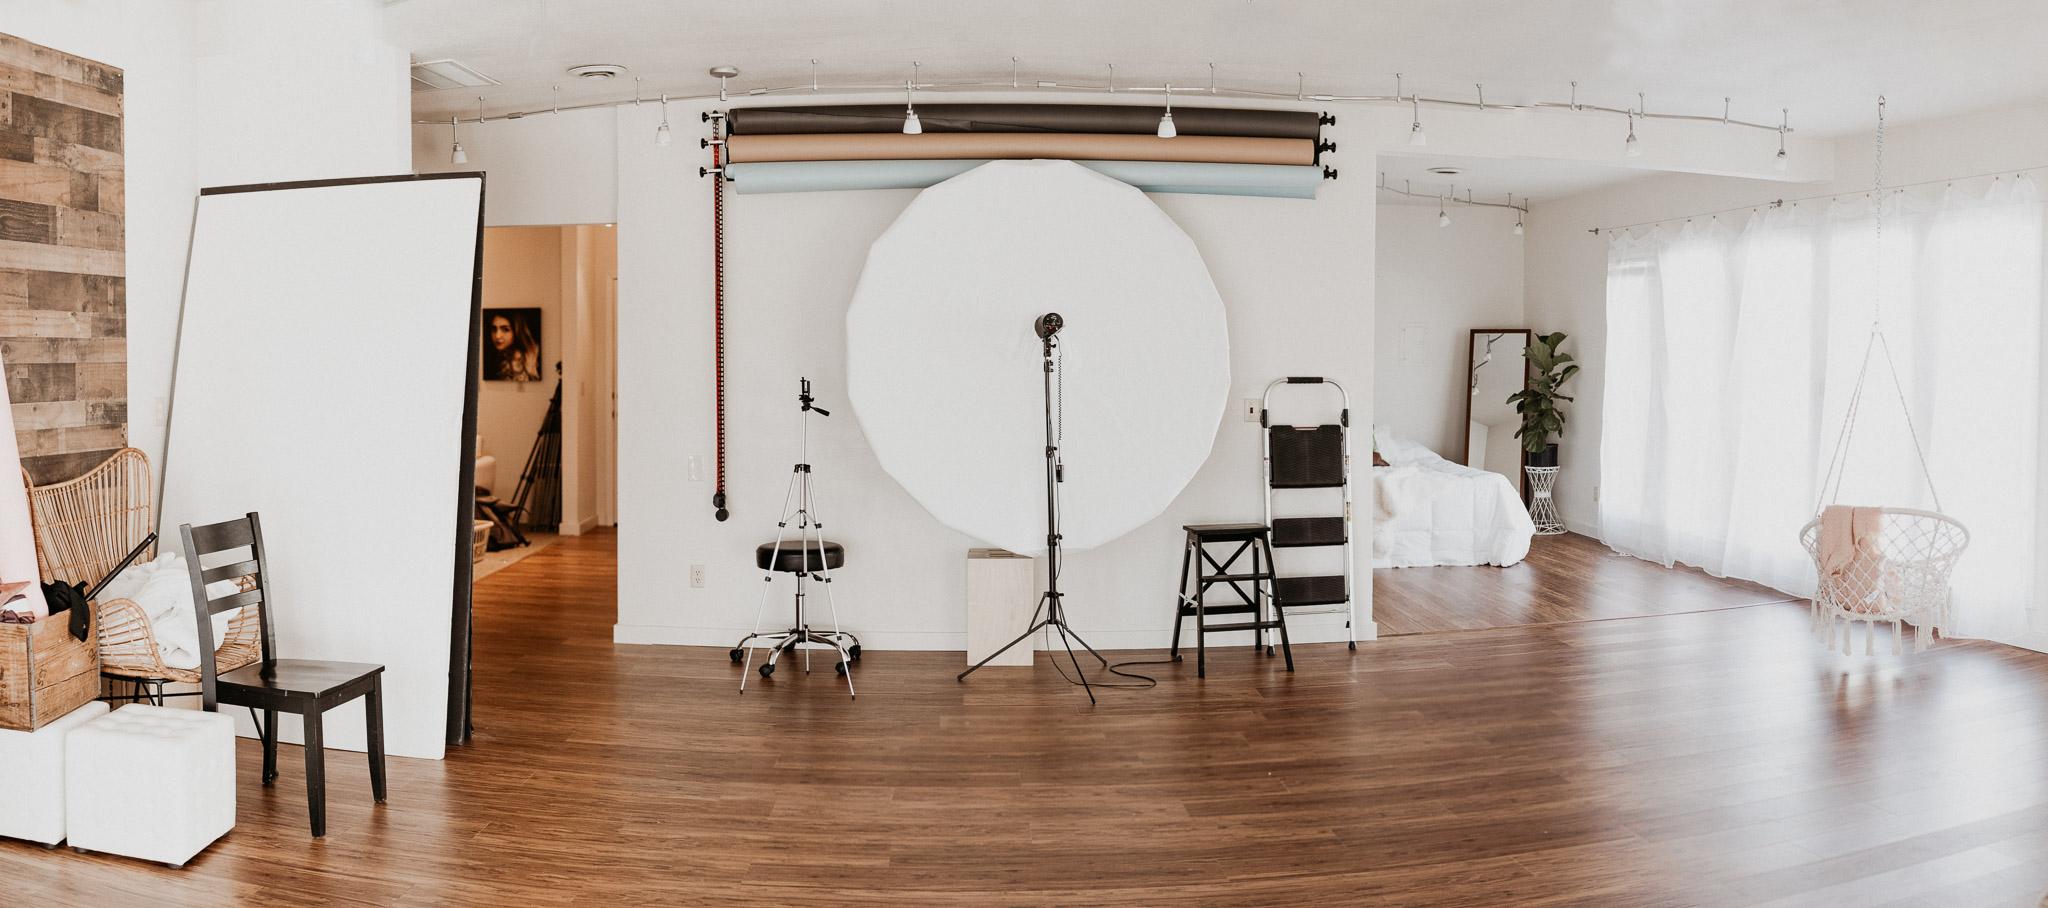 Studio 870 Boise Studio Rental Boise Boudoir Photographer Boudoir by Kayla Boudoir Studio Natural Light Inspo Ideas Meridian Natural Light Photography Studio